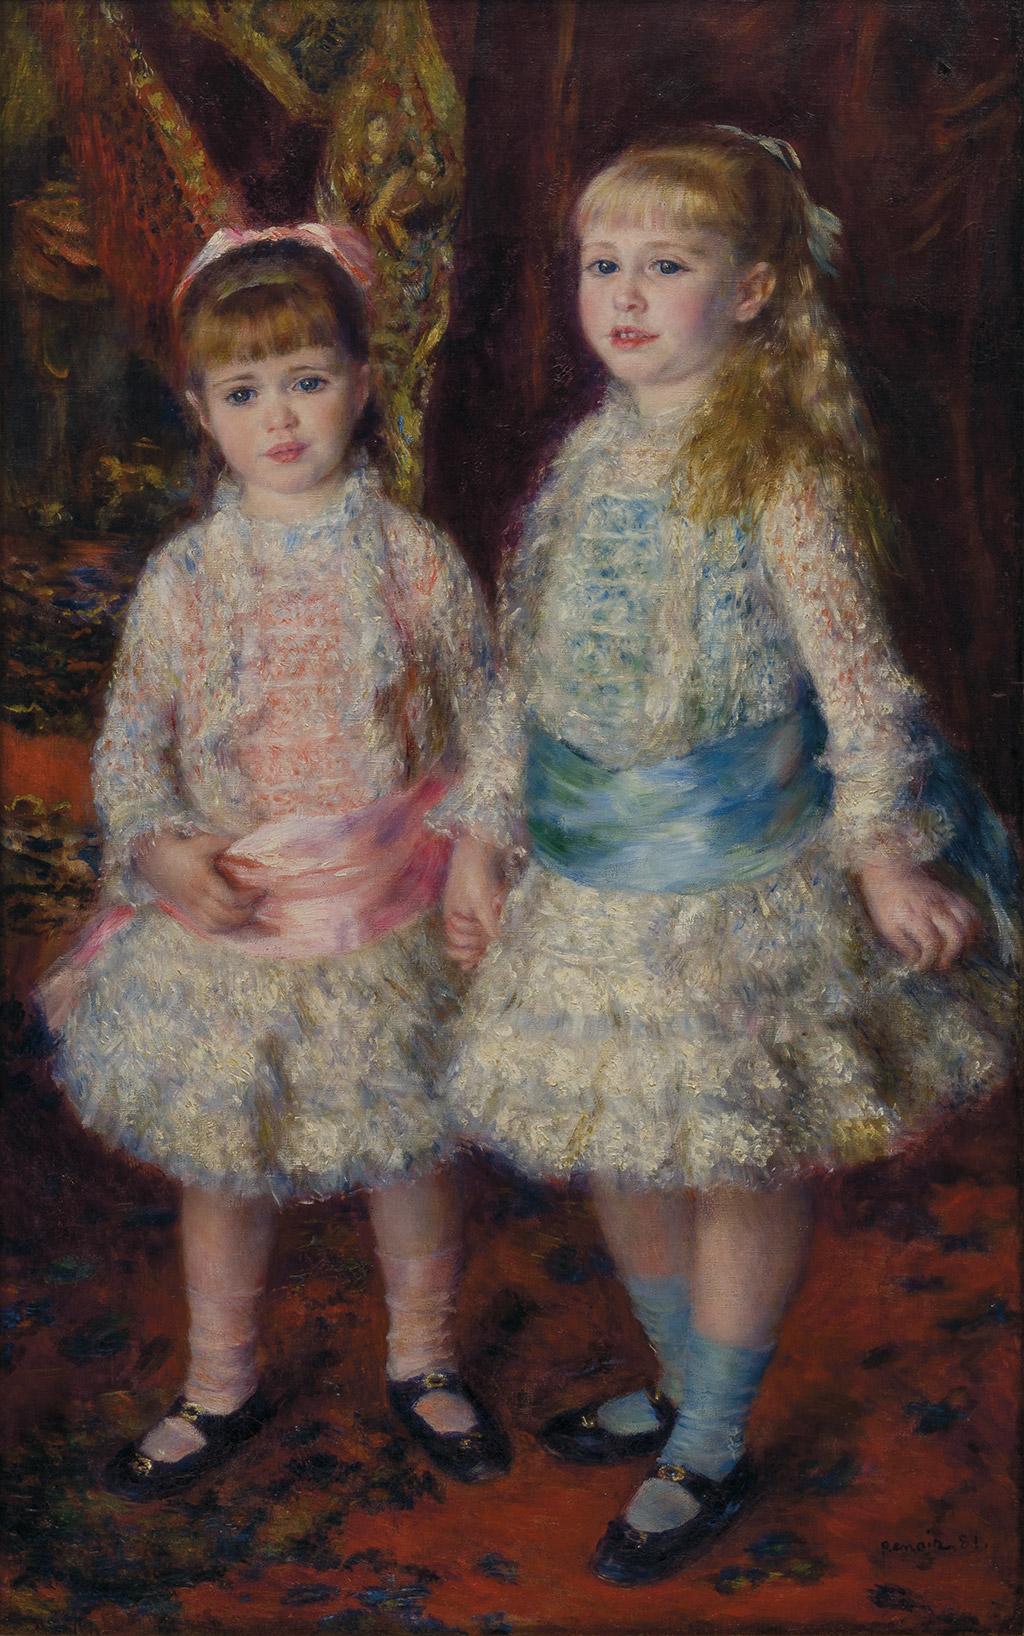 Rosa e azul - As meninas Cahen d'Anvers, de Renoir, no MASP